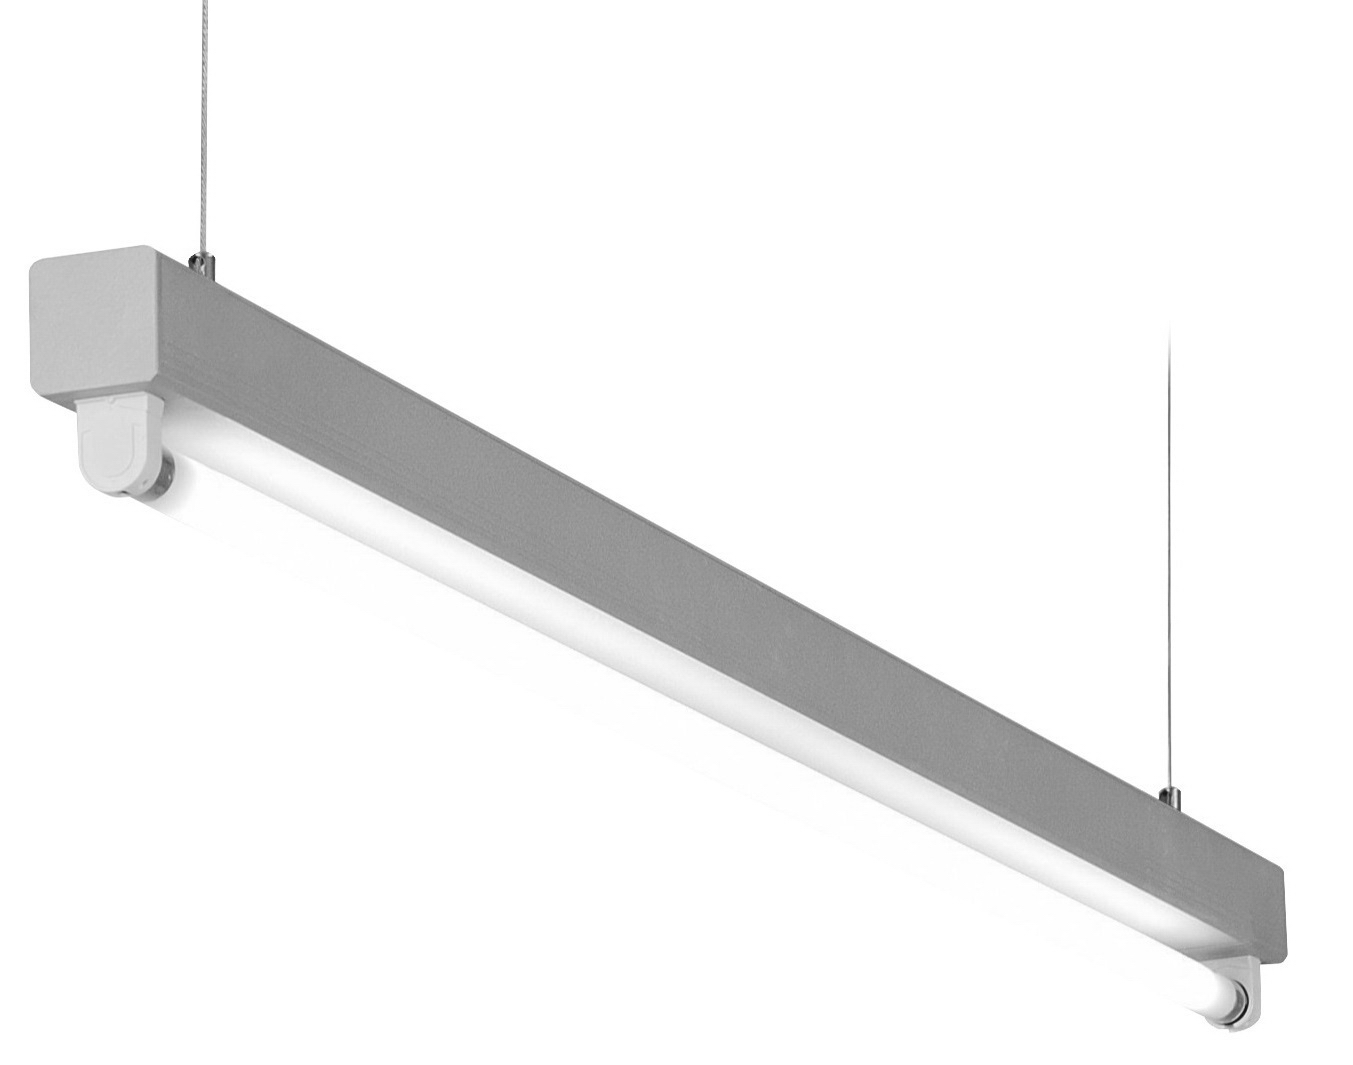 1 Stk Lucie T5 1x14/24W Aluminium Lichtleiste, QTI, EVG LI38LUC124